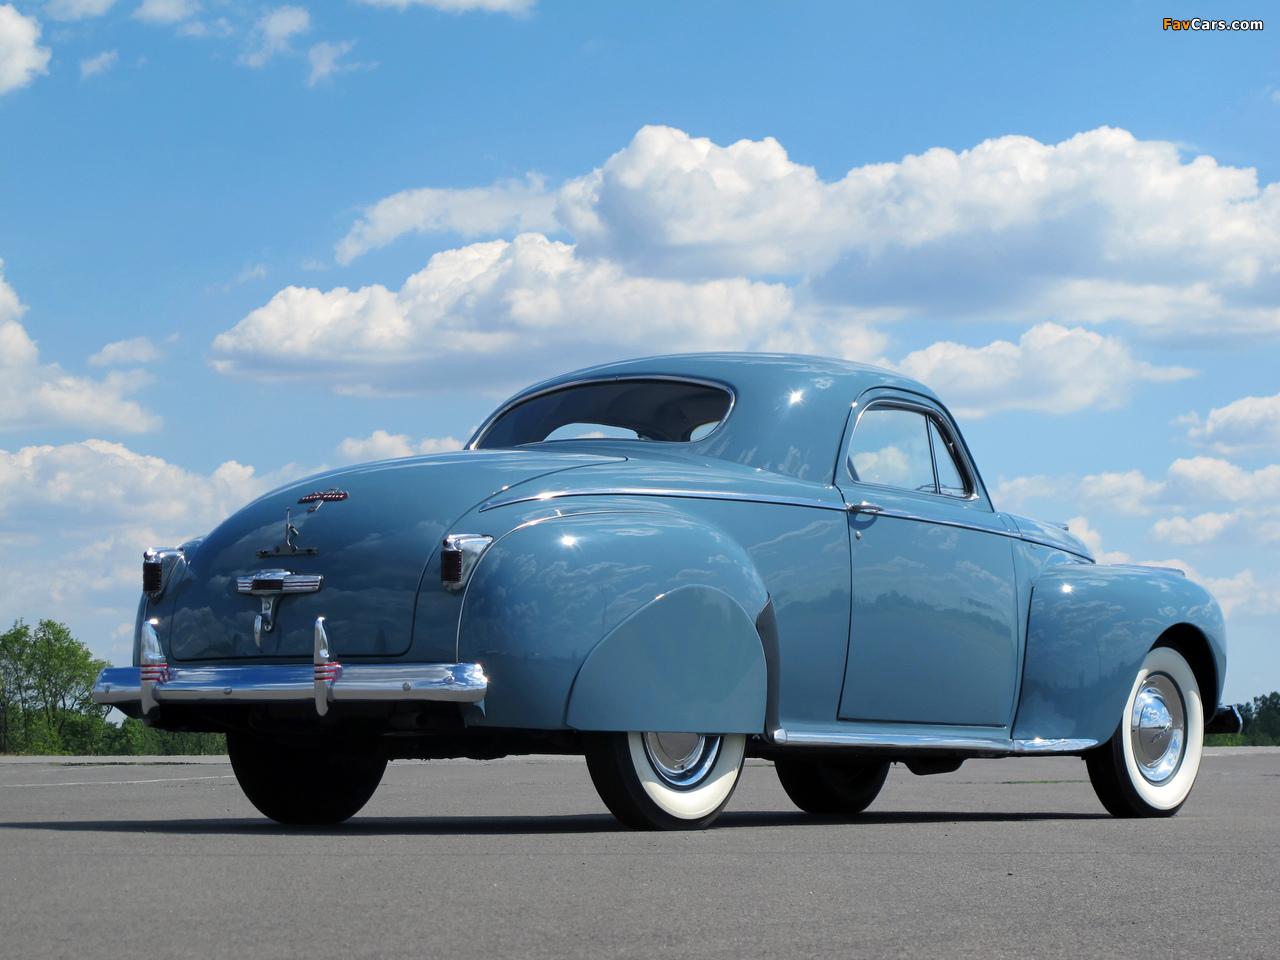 Chrysler Royal Coupe 1941 wallpapers (1280 x 960)